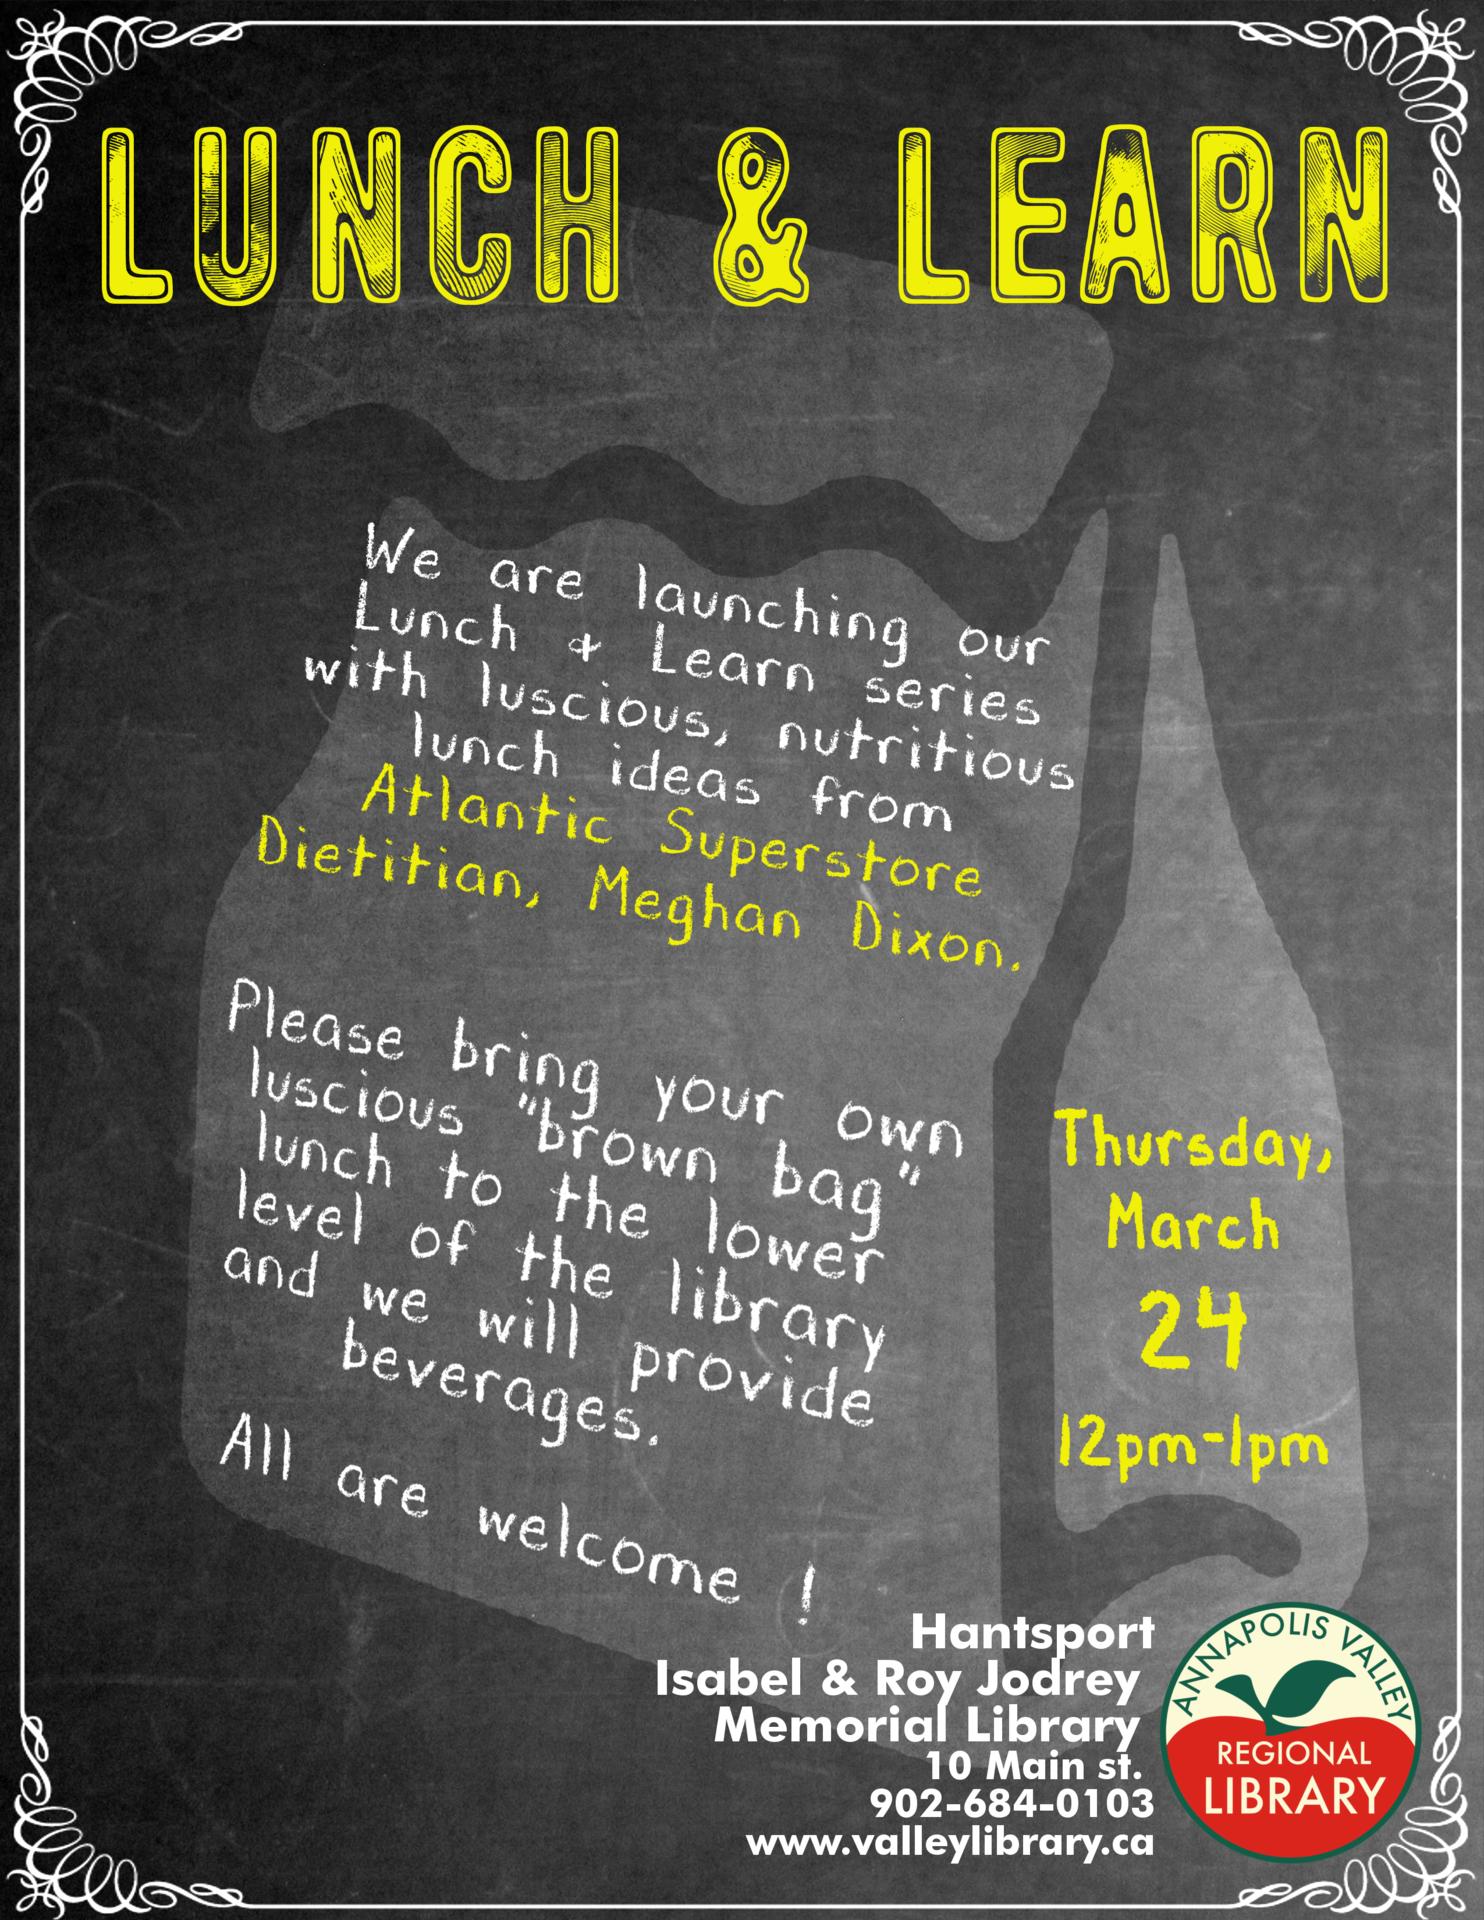 Lunch & Learn : Healthy Lunch Ideas At Isabel & Roy Jodrey